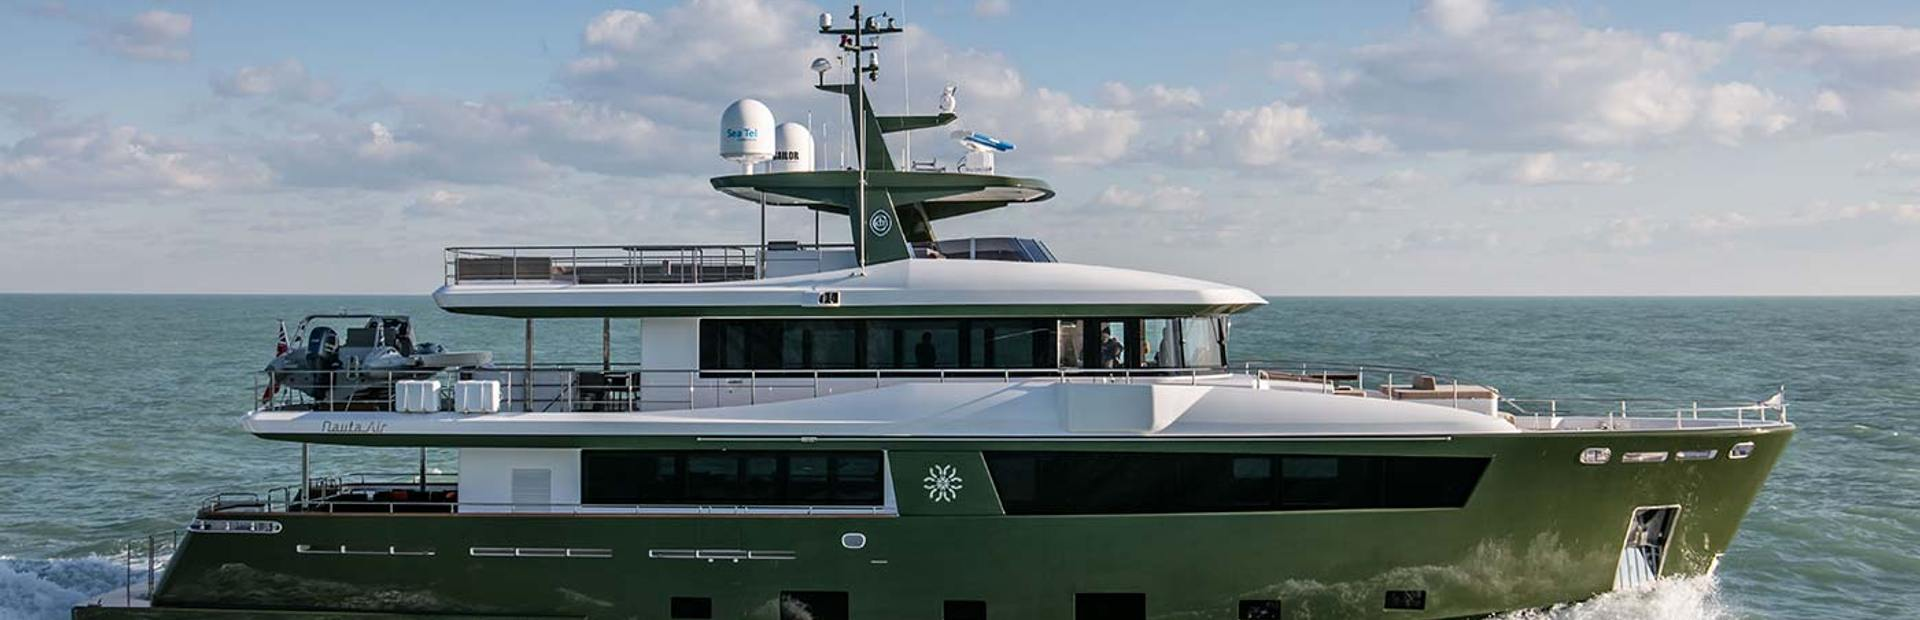 Cantiere Delle Marche Nauta Air 111 Yacht Charter